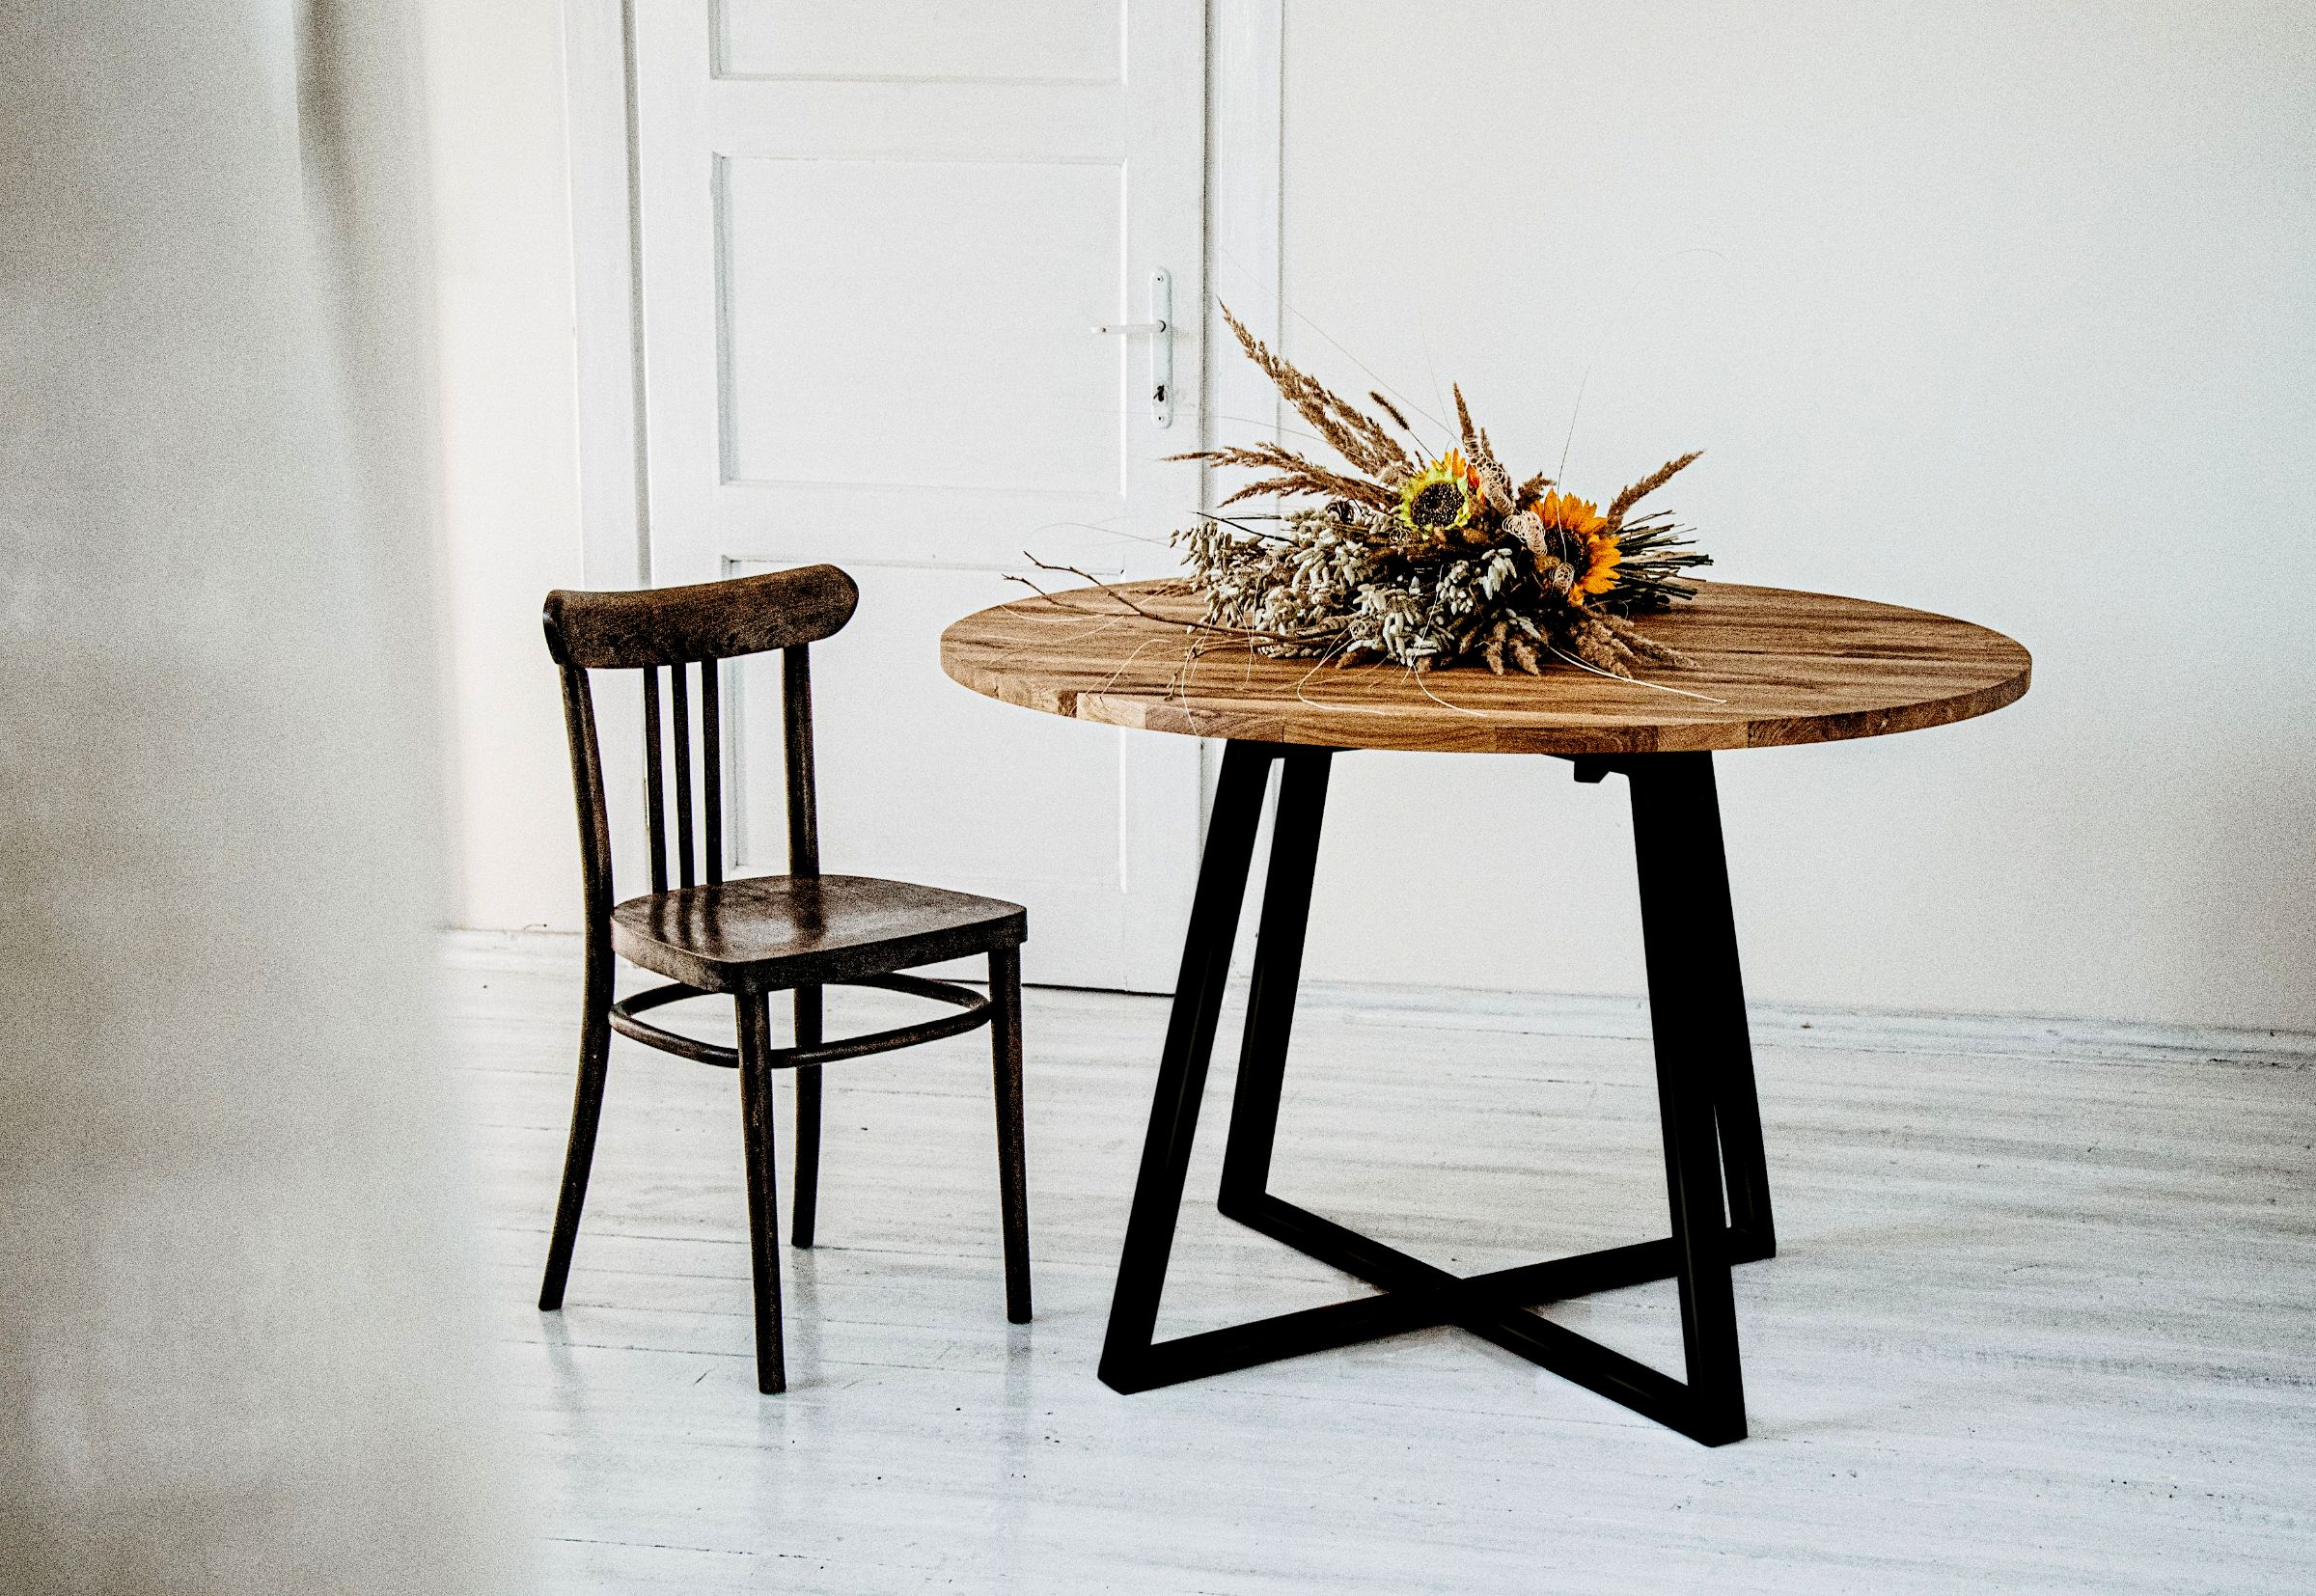 1_Måne Black II Round Table